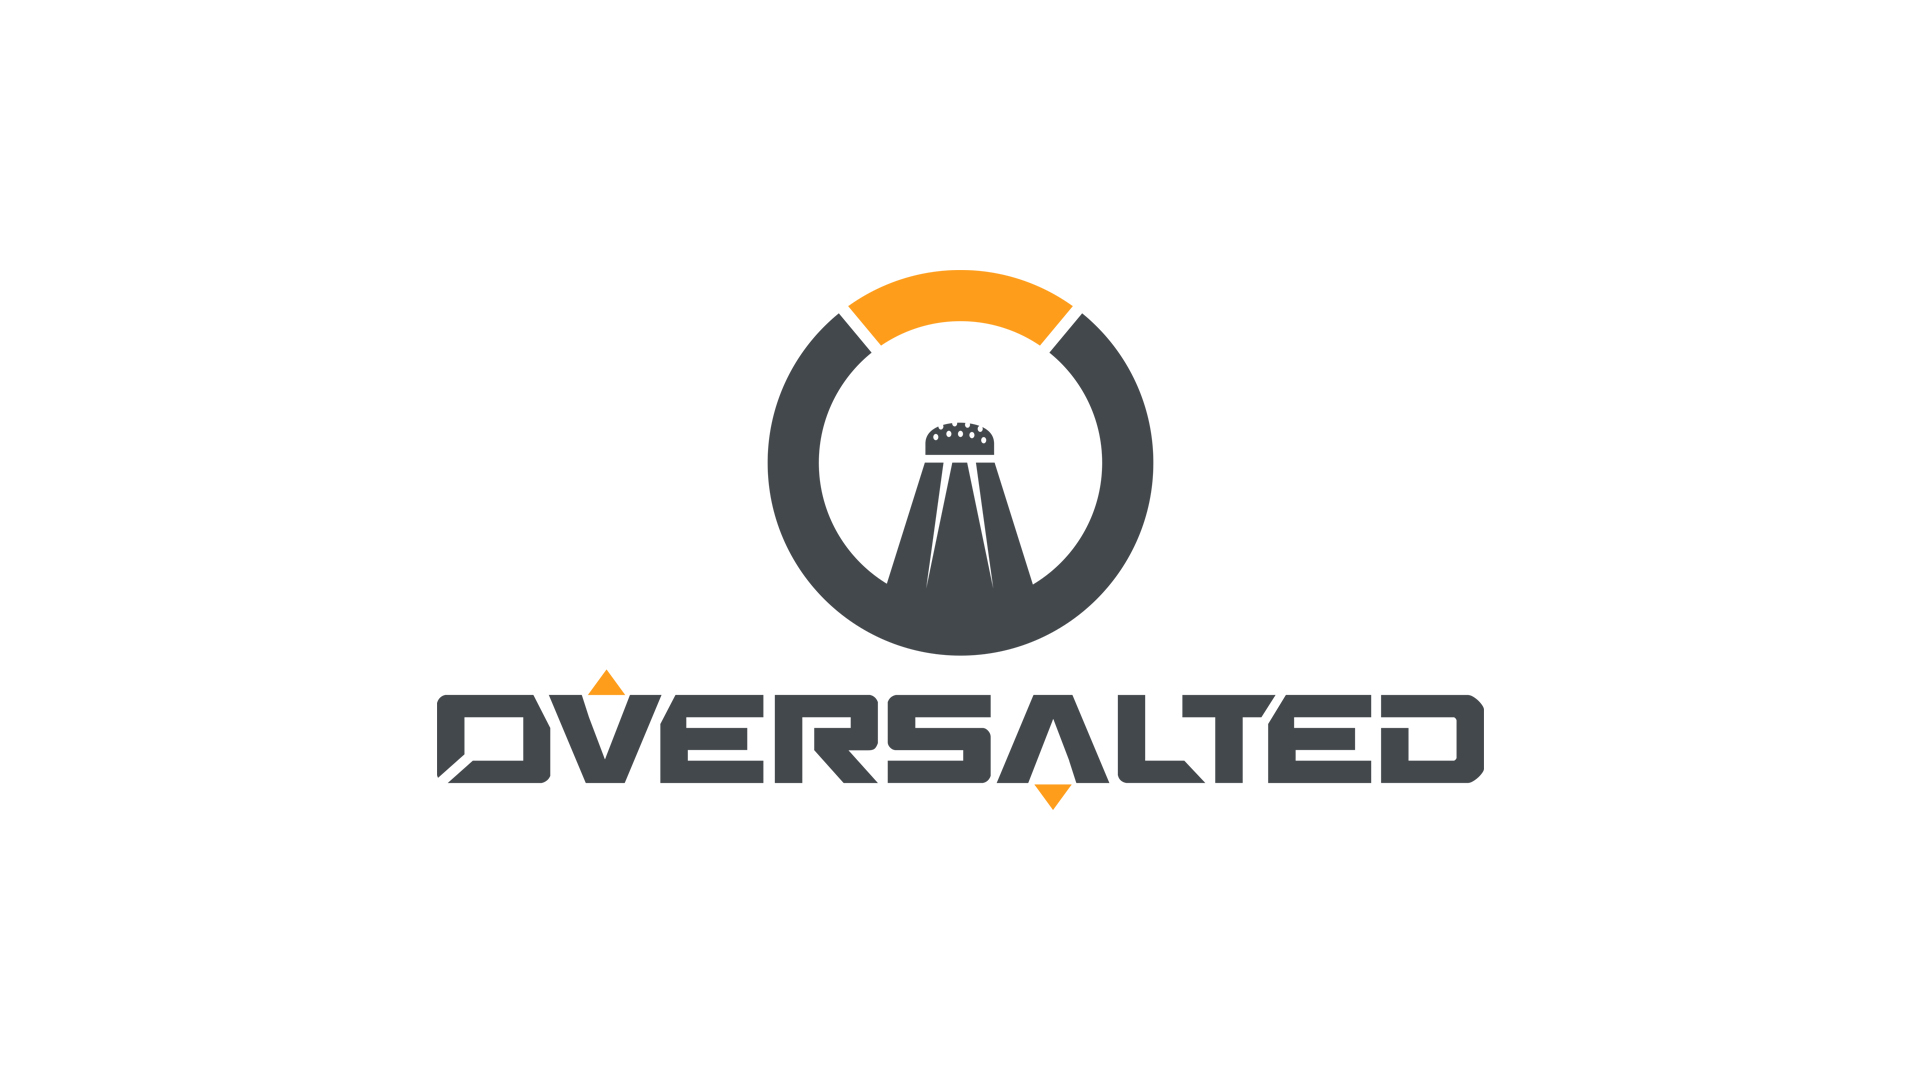 Oversalted Logo Wallpaper